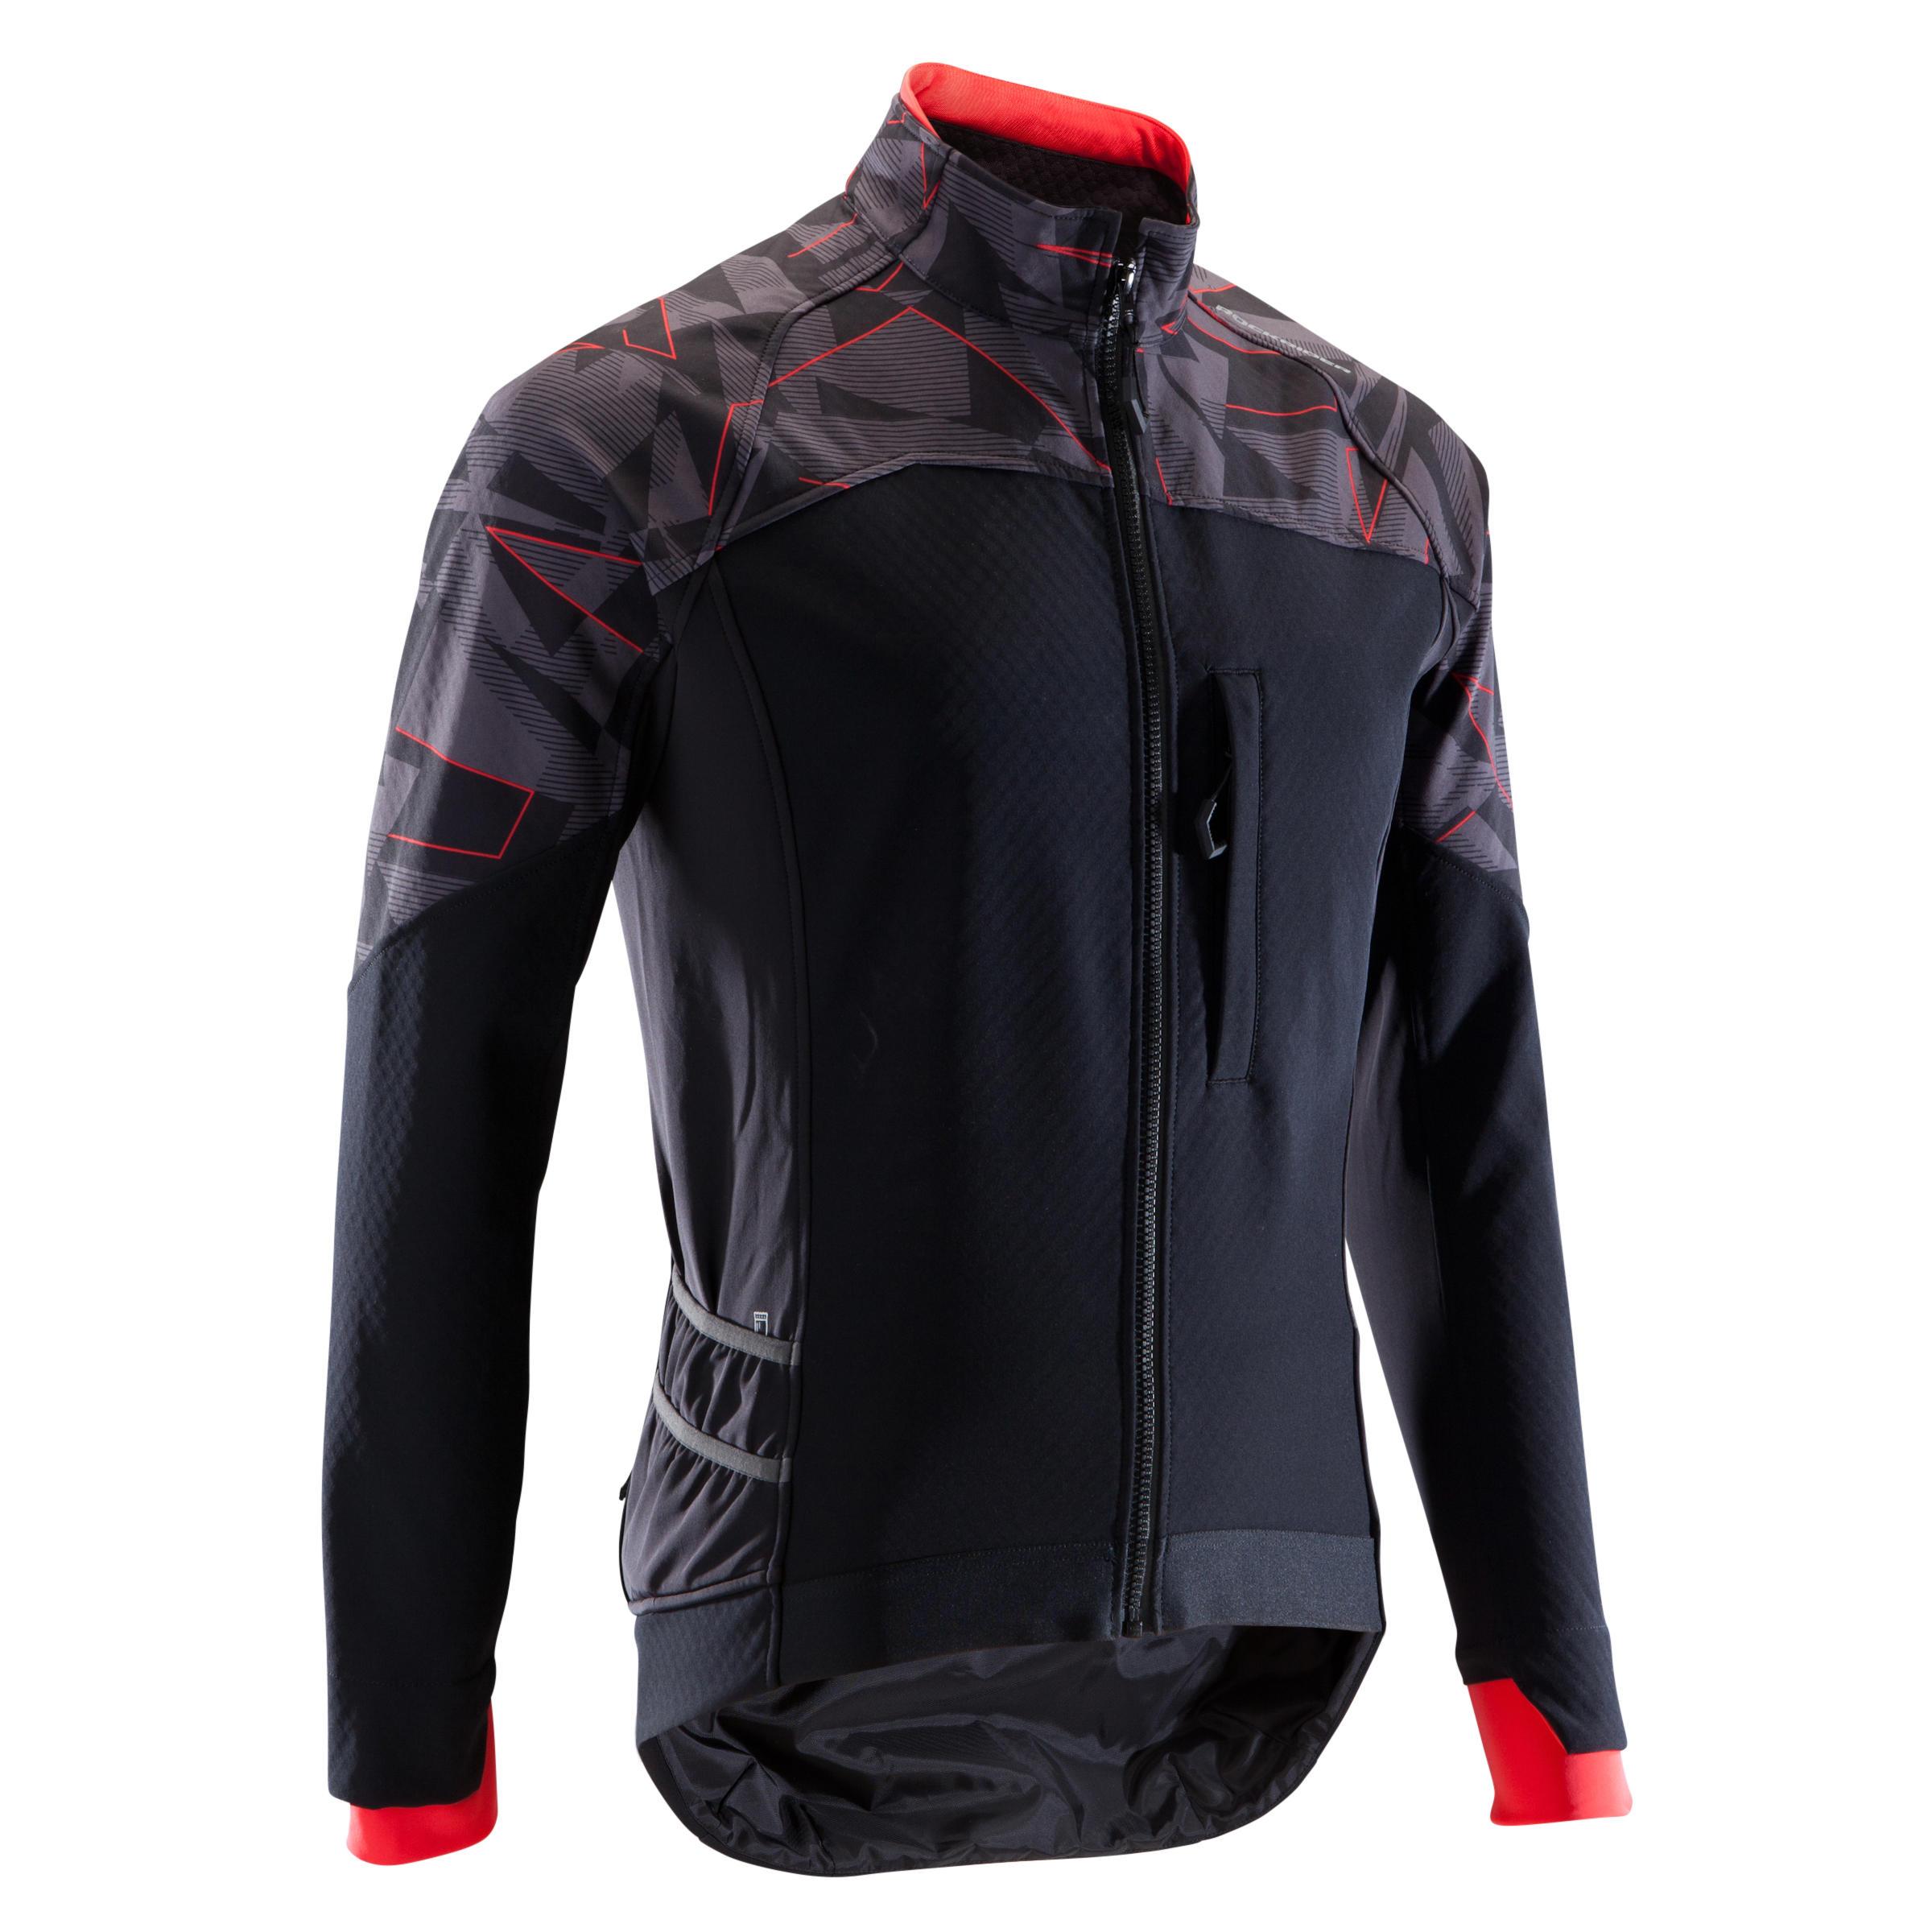 MTB-Fahrradjacke ST 500 Herren schwarz/neonrot | Sportbekleidung > Sportjacken > Fahrradjacken | Schwarz - Rot | Trikot - Wo | Rockrider